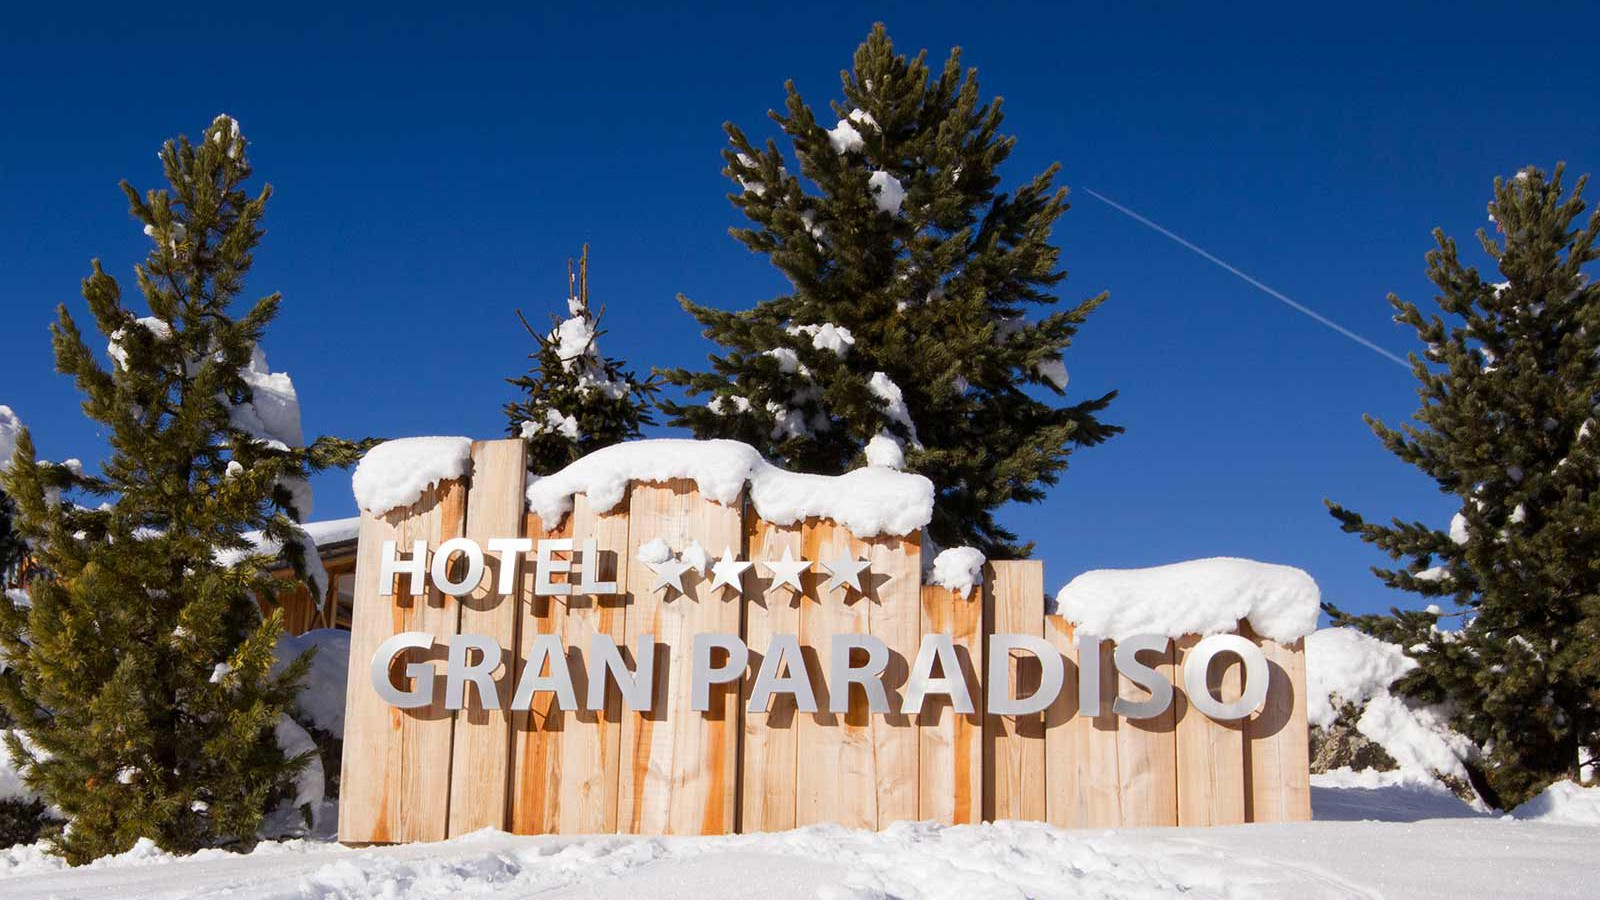 Hotel Gran Paradiso - Name